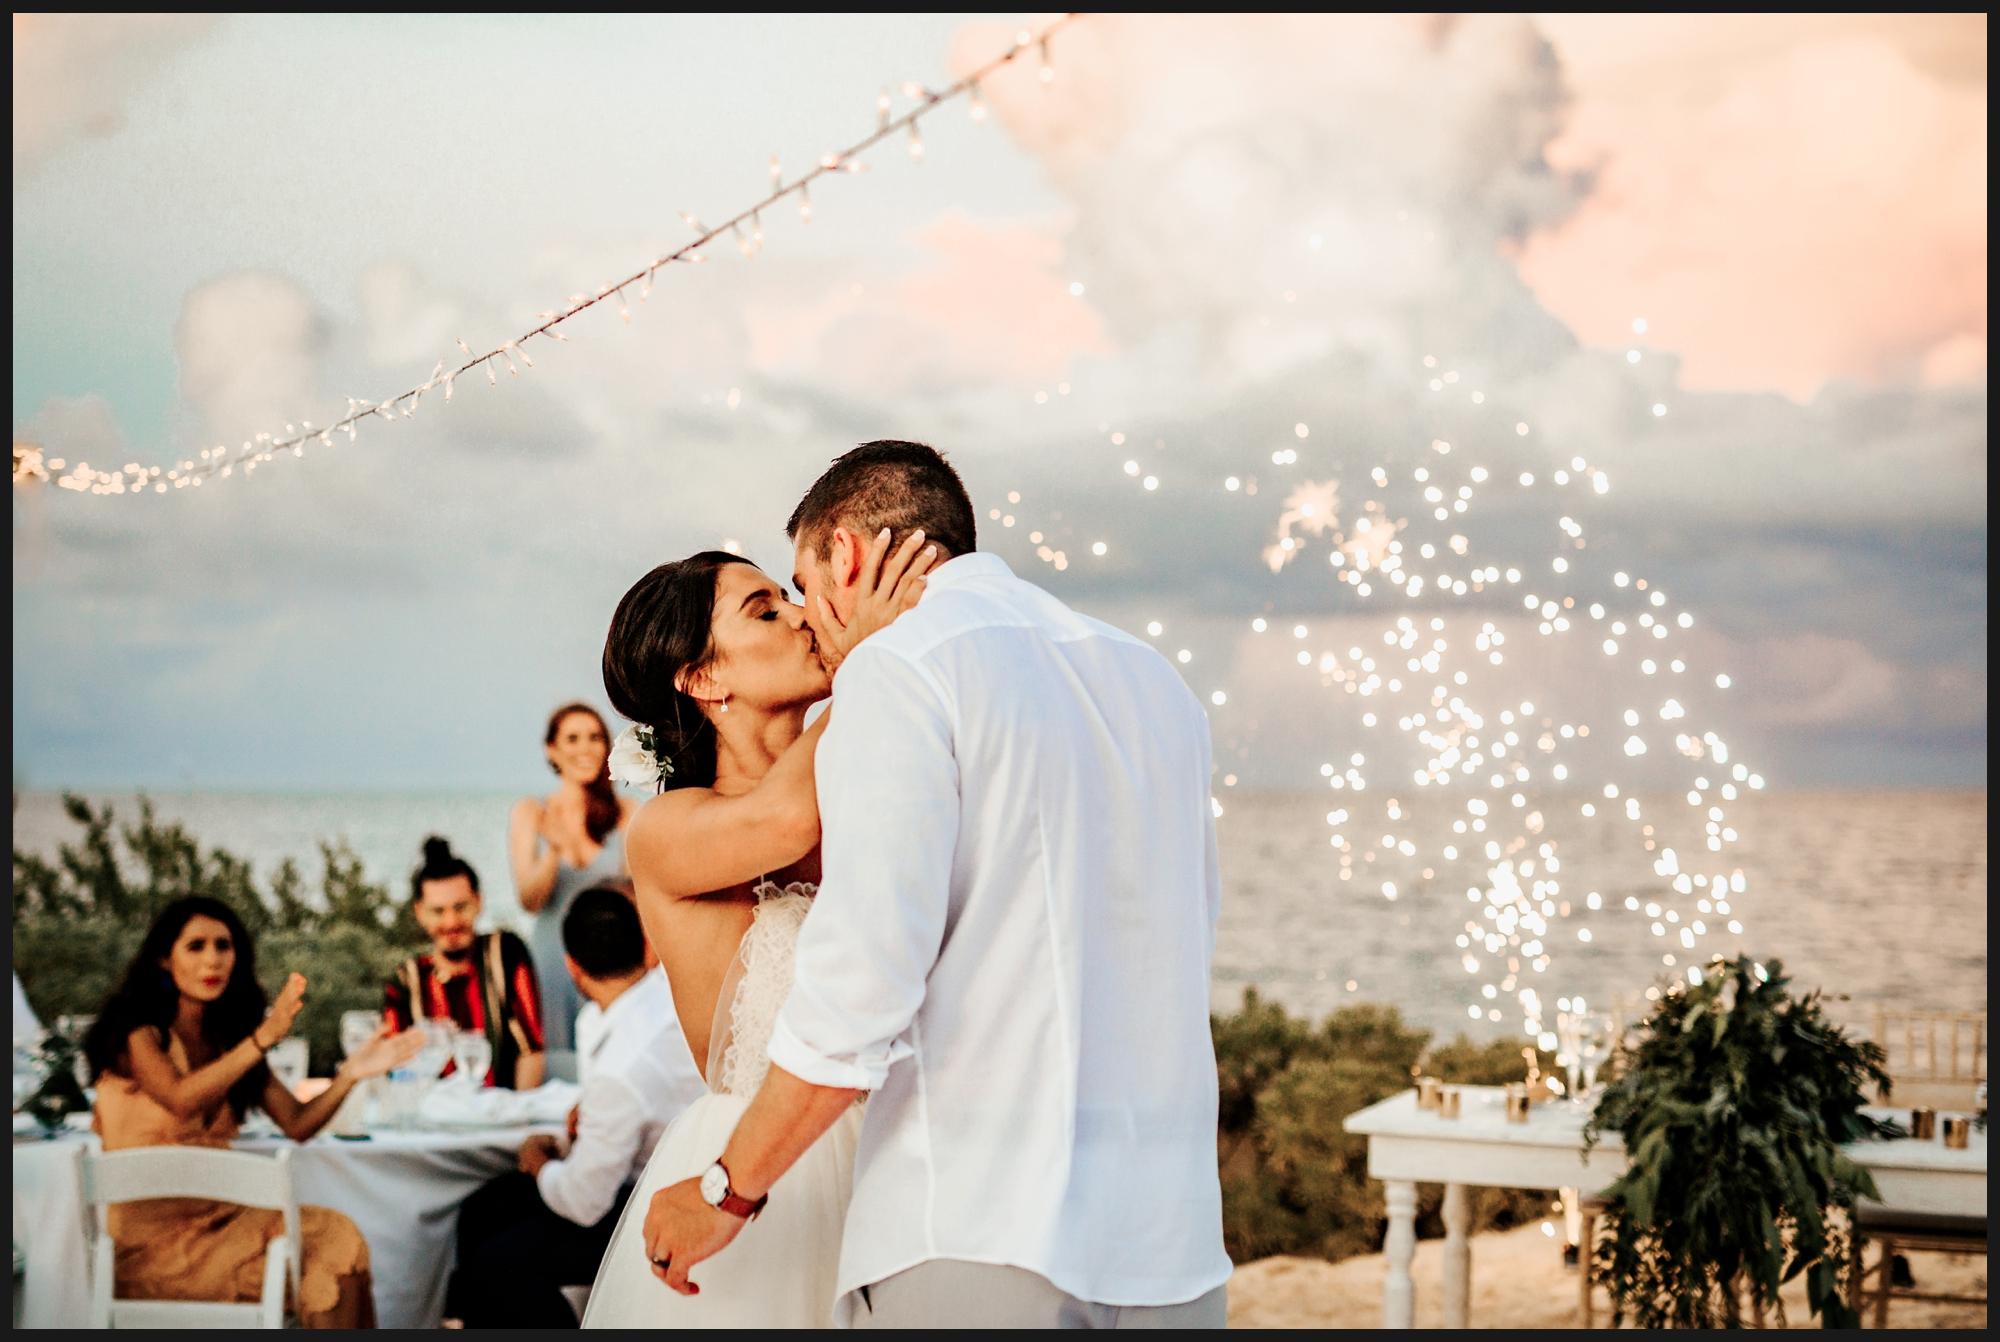 Orlando-Wedding-Photographer-destination-wedding-photographer-florida-wedding-photographer-bohemian-wedding-photographer_0539.jpg